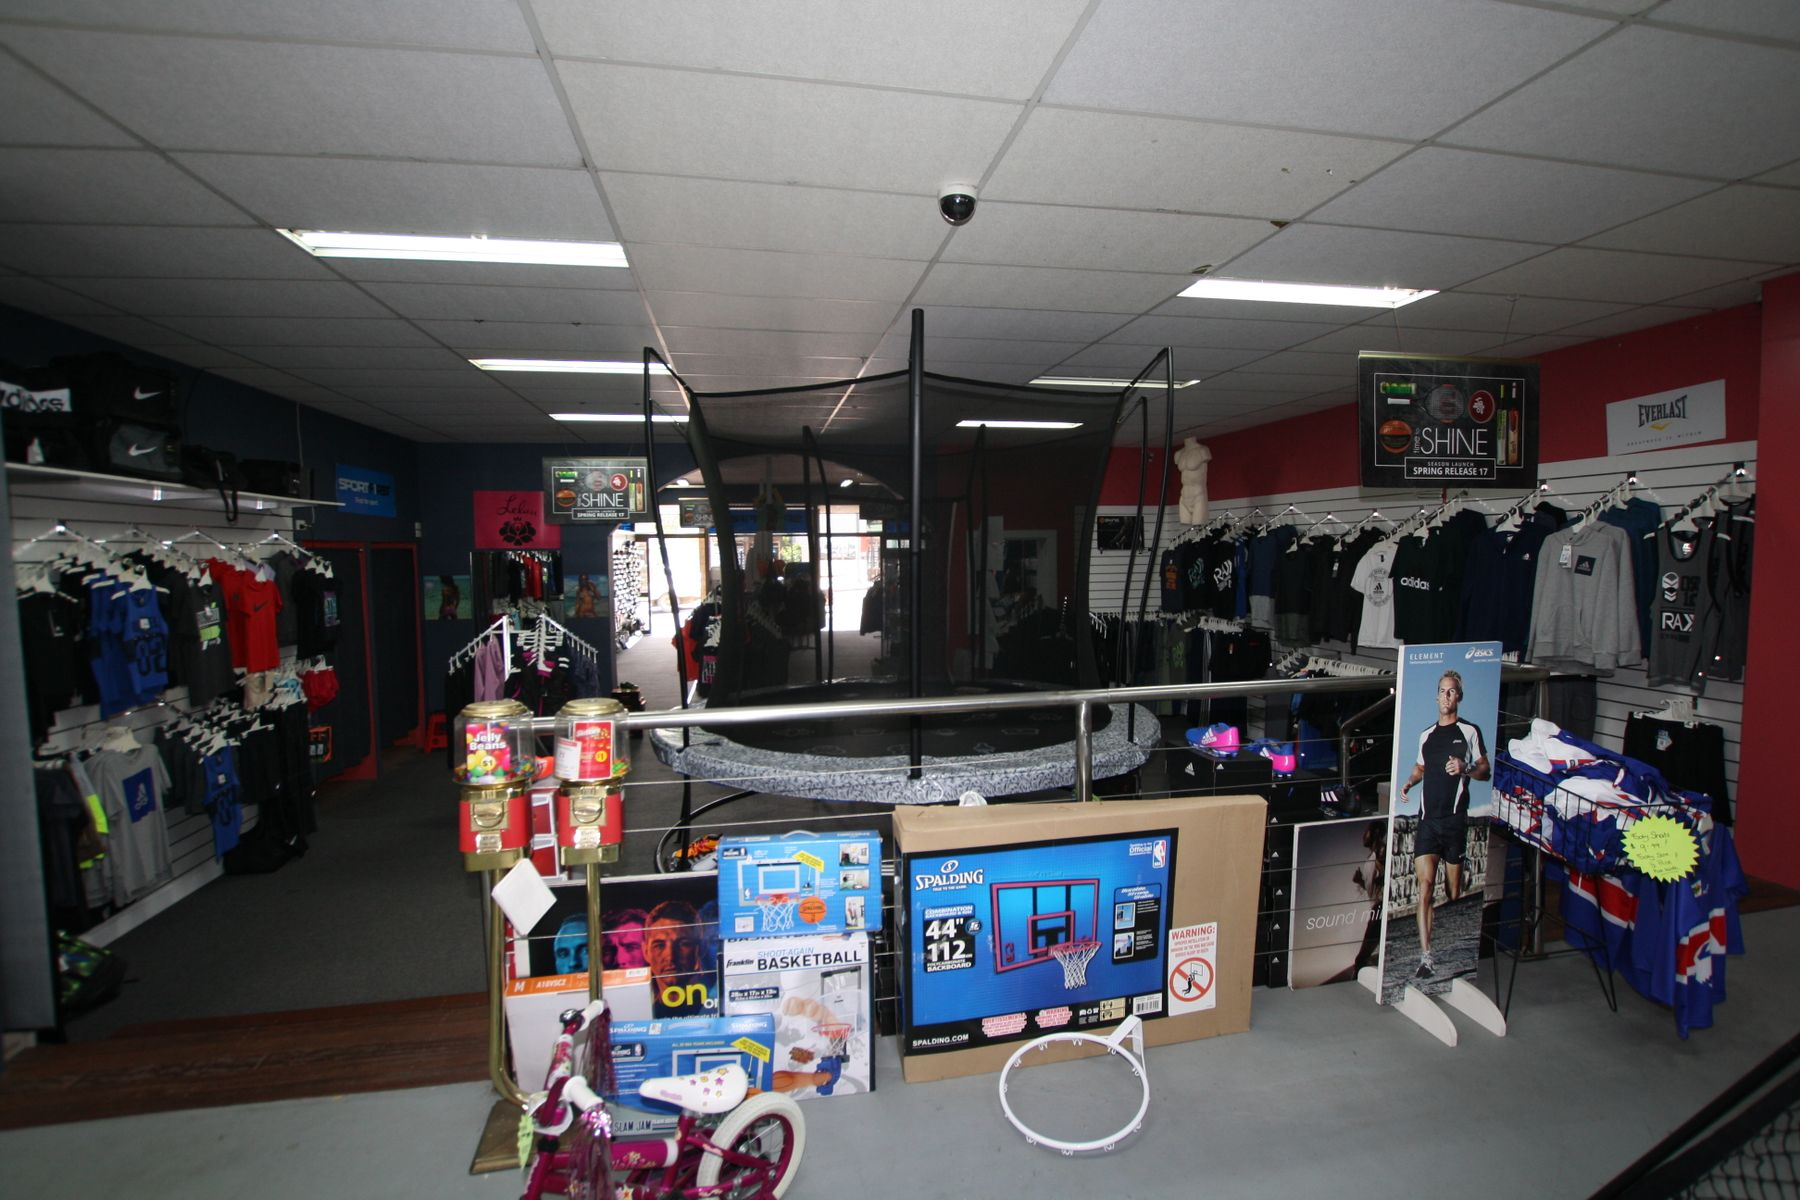 21 Commercial Street, Korumburra, VIC 3950